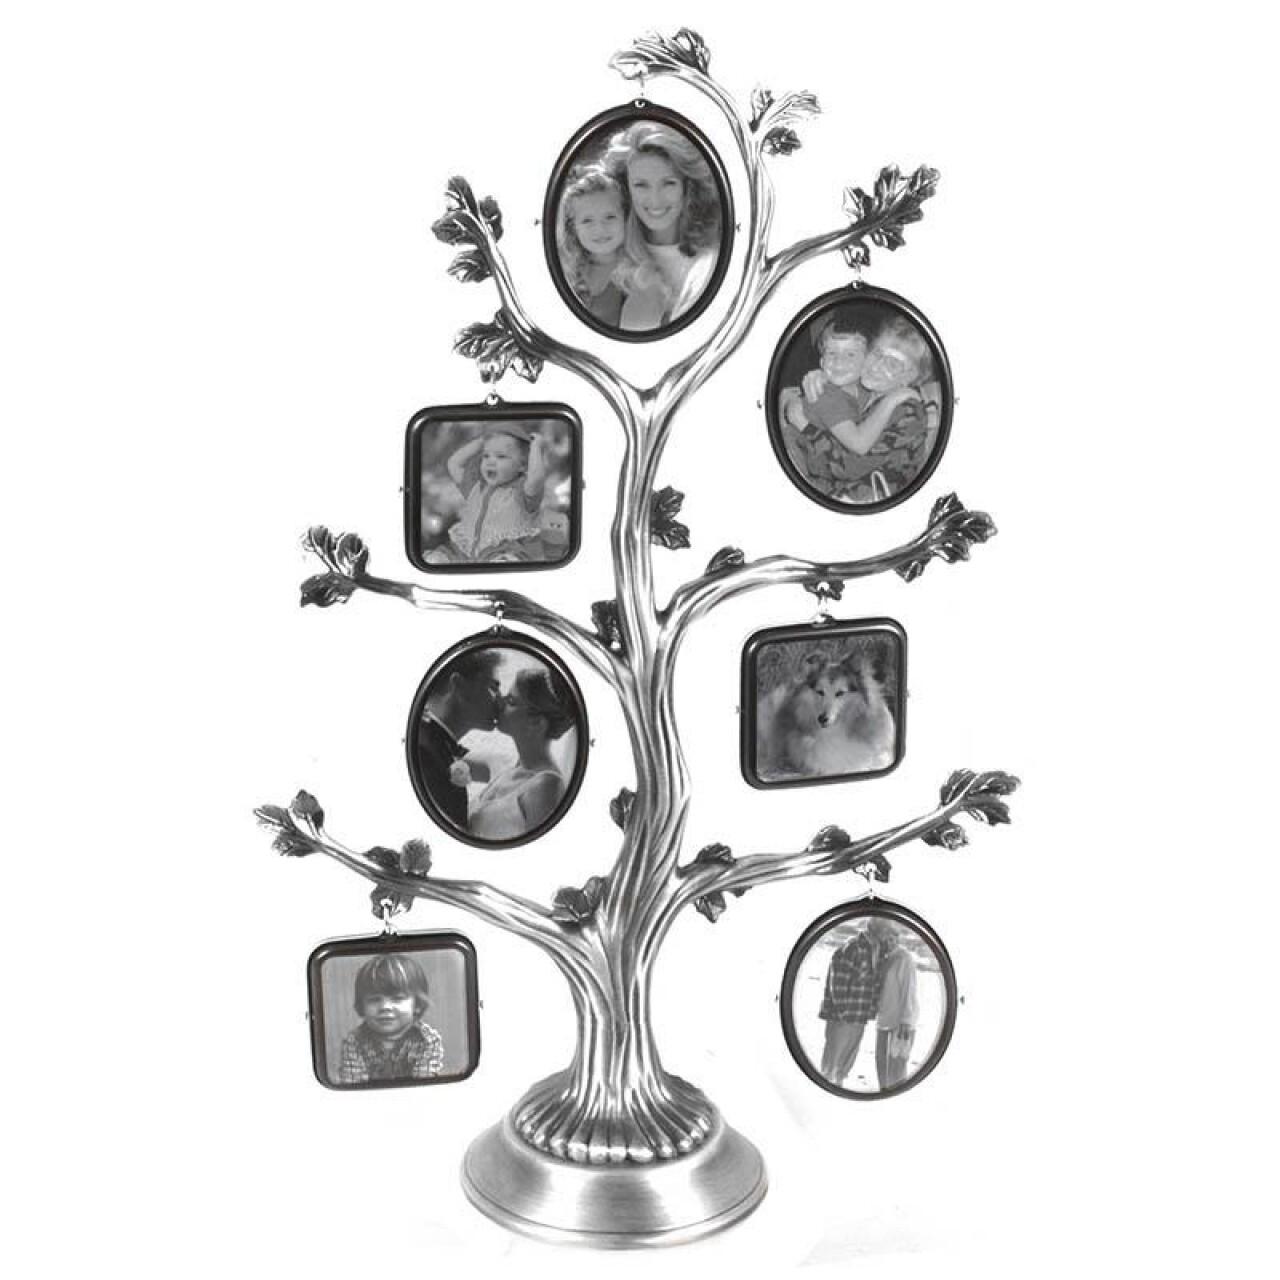 Rama foto Silver Tree, InArt, 16 x 25 cm, aluminiu/sticla, argintiu